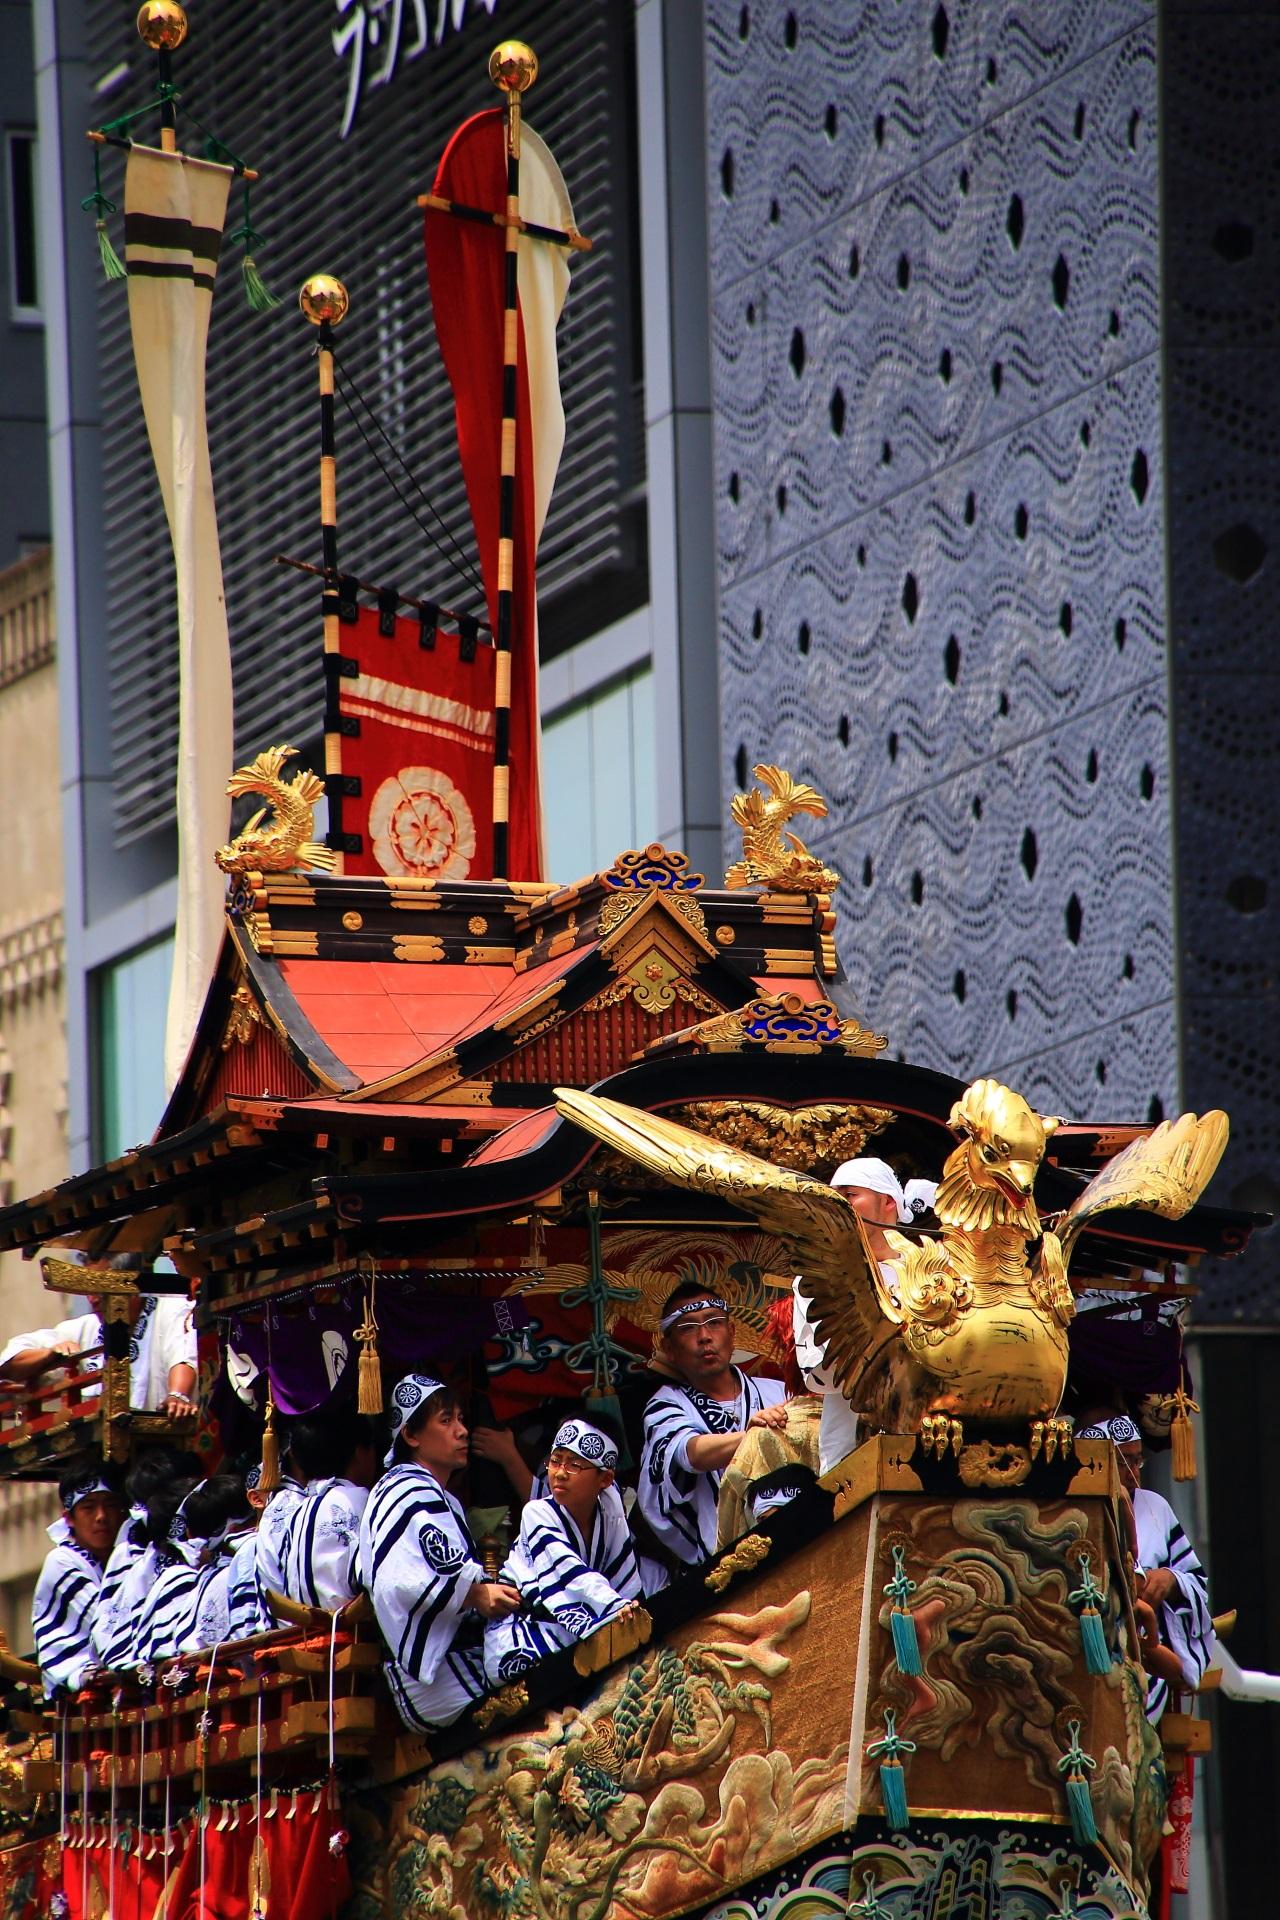 Fune-Hoko of Yamahoko-Junko Cruise of Gion-Matsuri Festival in Kyoto